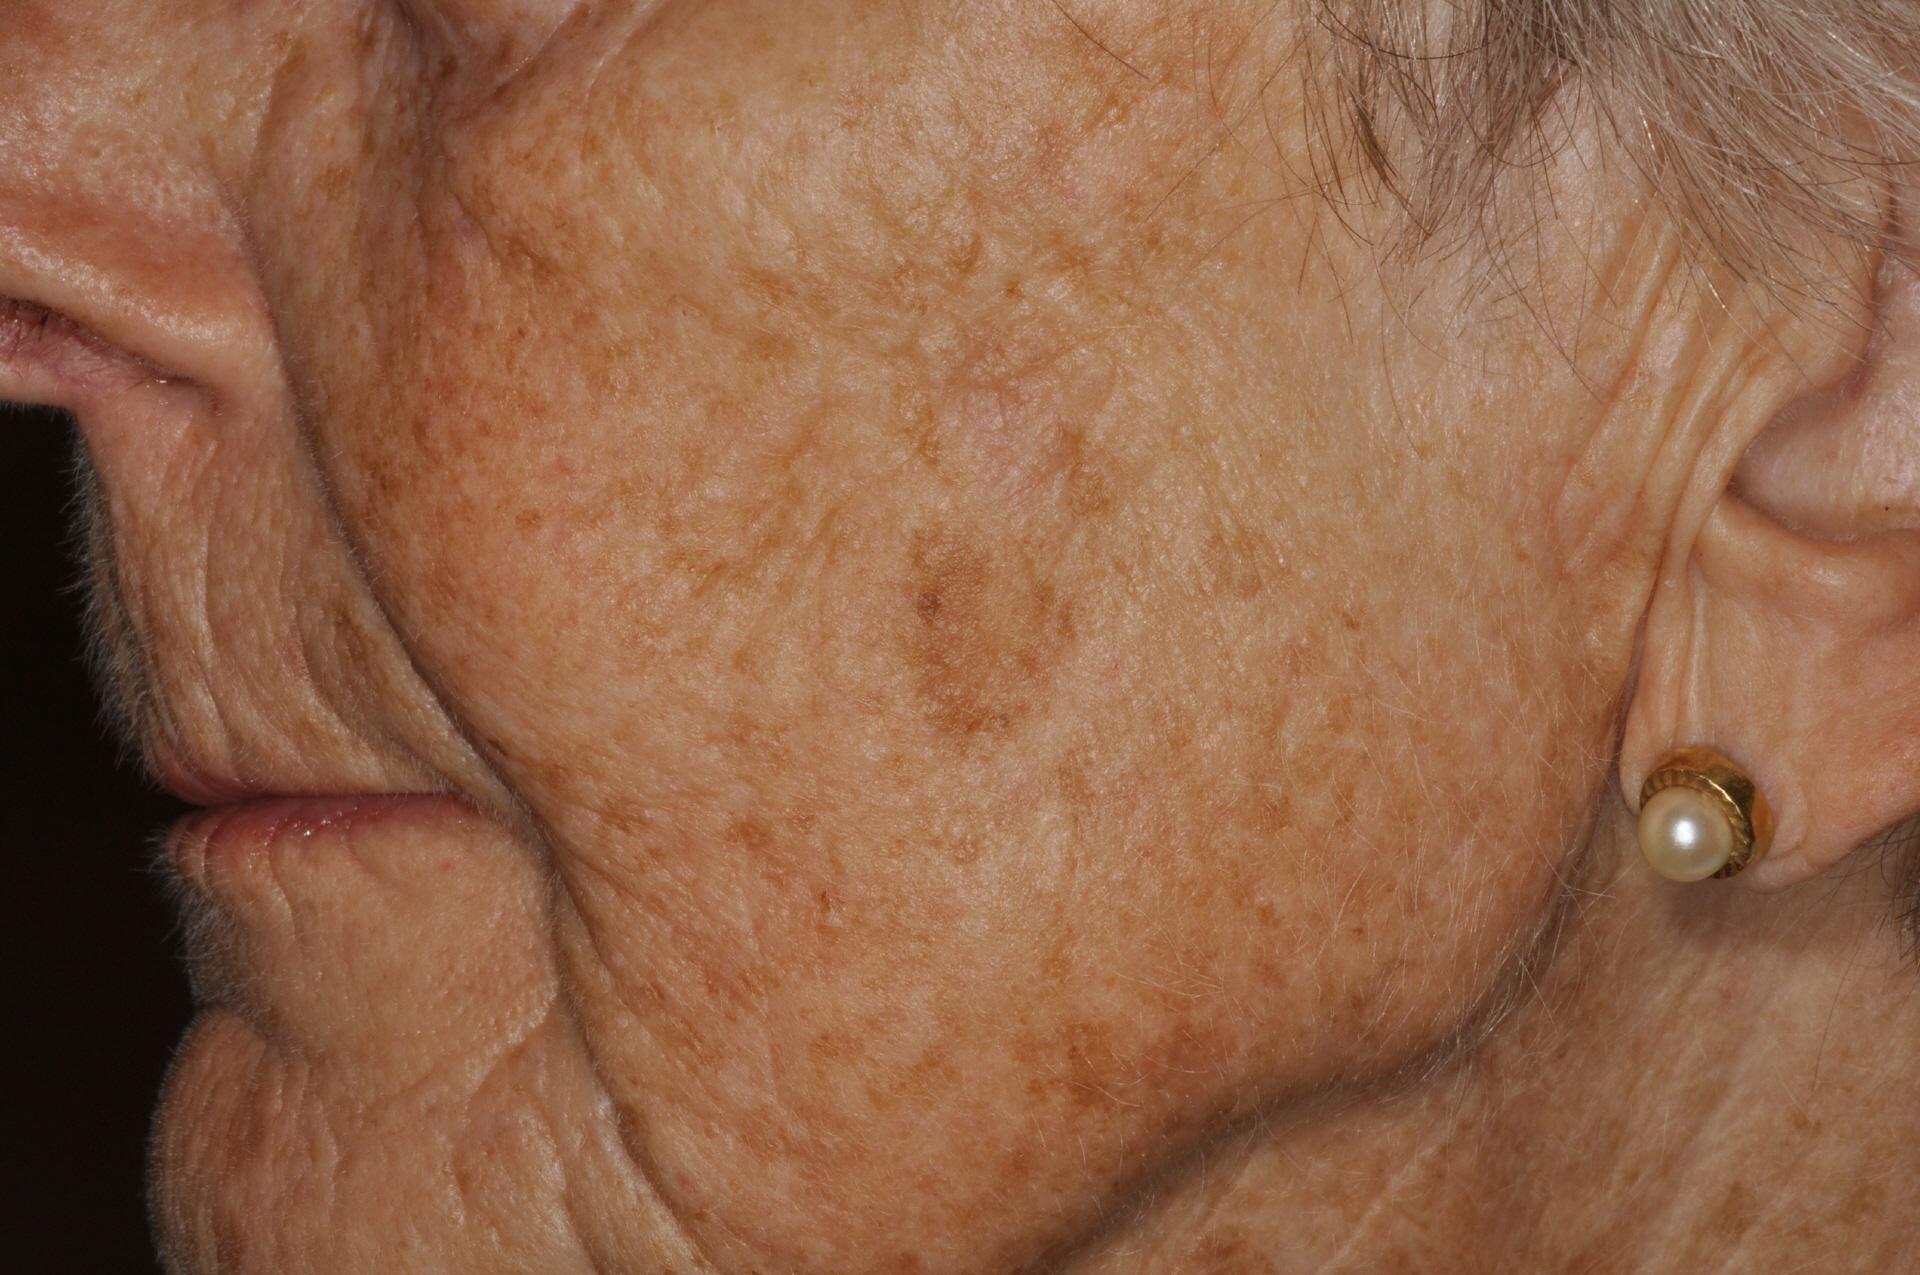 Hautarztpraxis Dr Hempel Altersflecken Laserentfernung